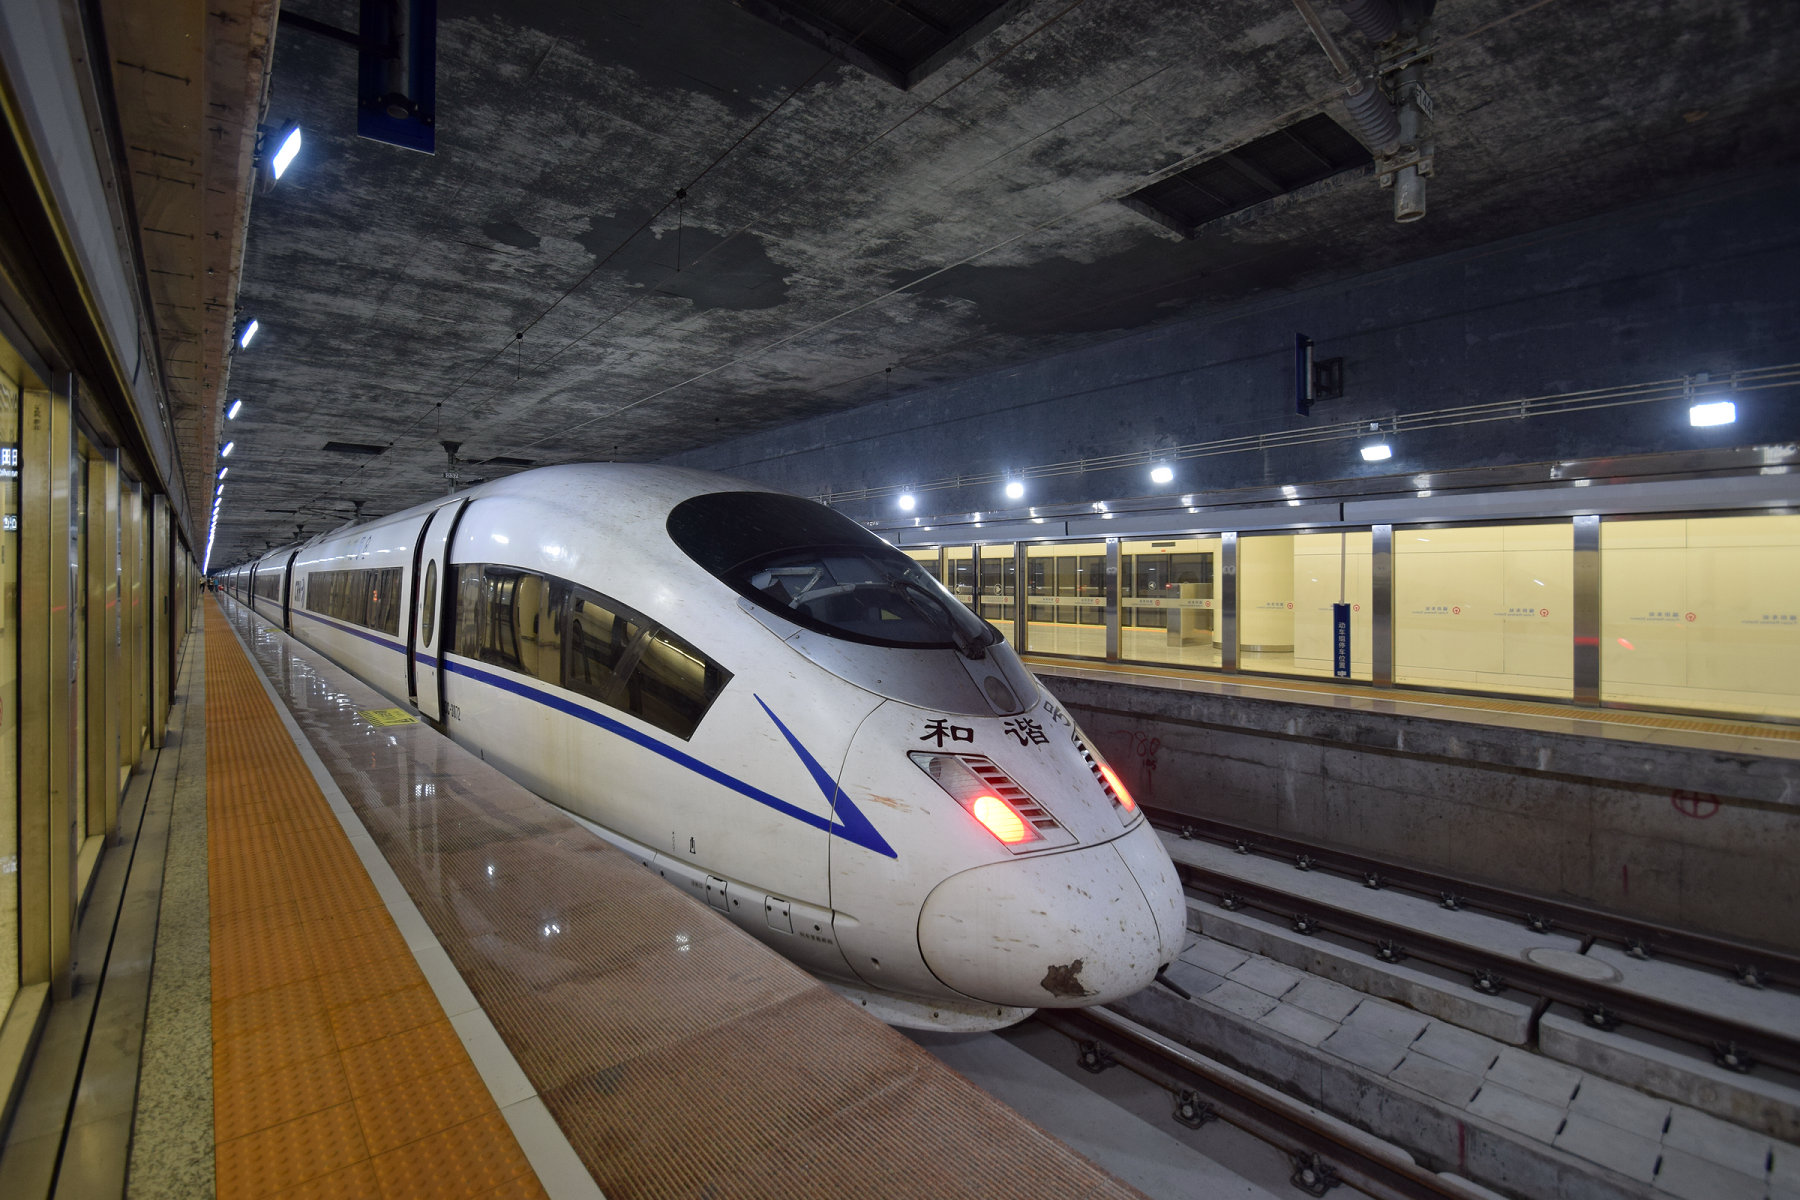 Futian_Railway_Station_G6018_CRH3C-3072.jpg